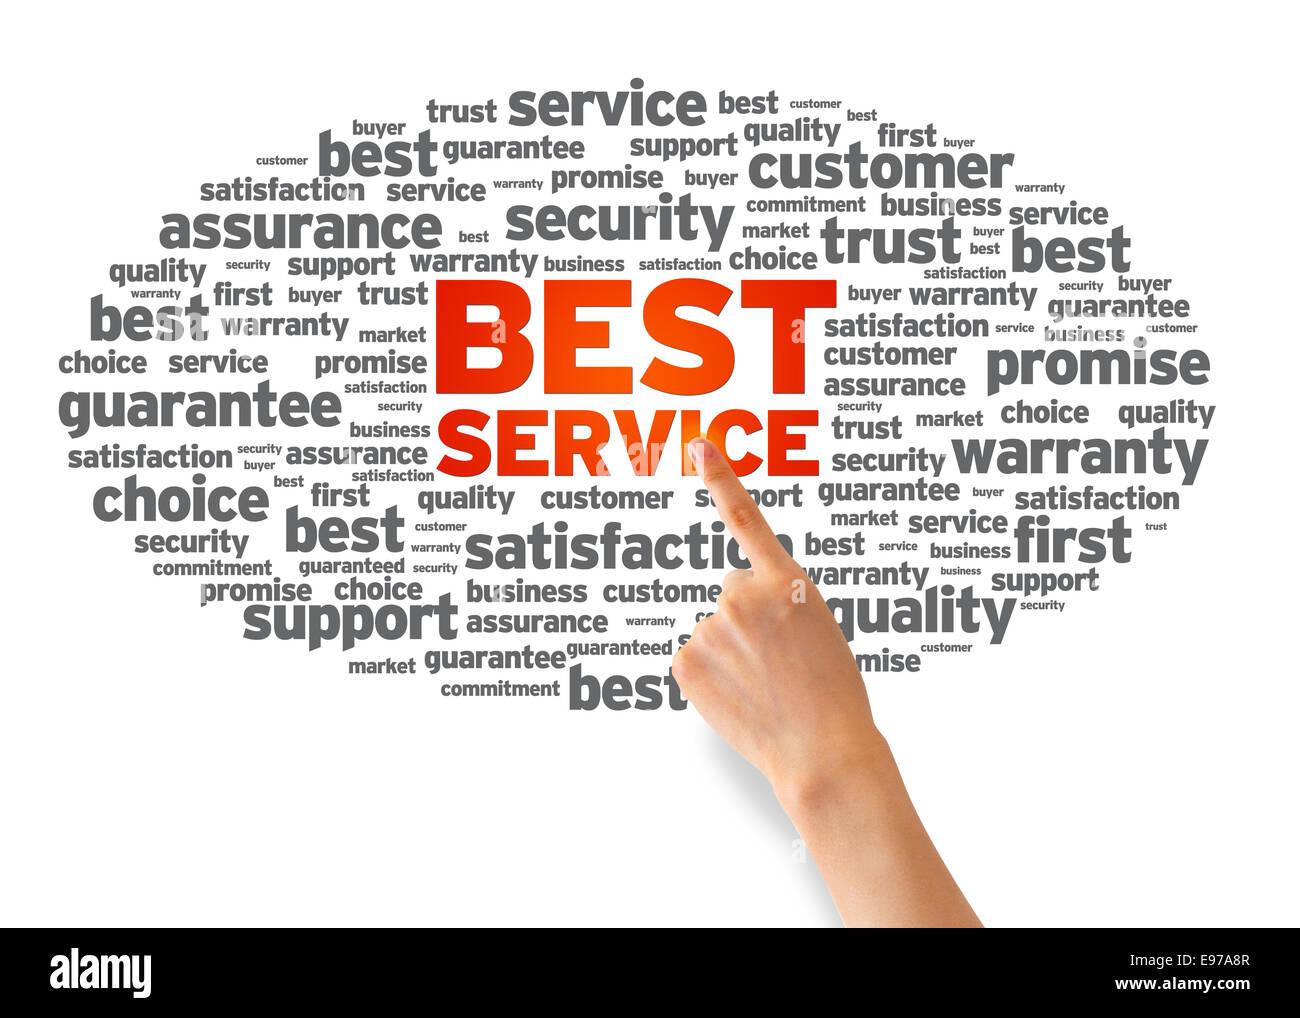 Best Service - Stock Image